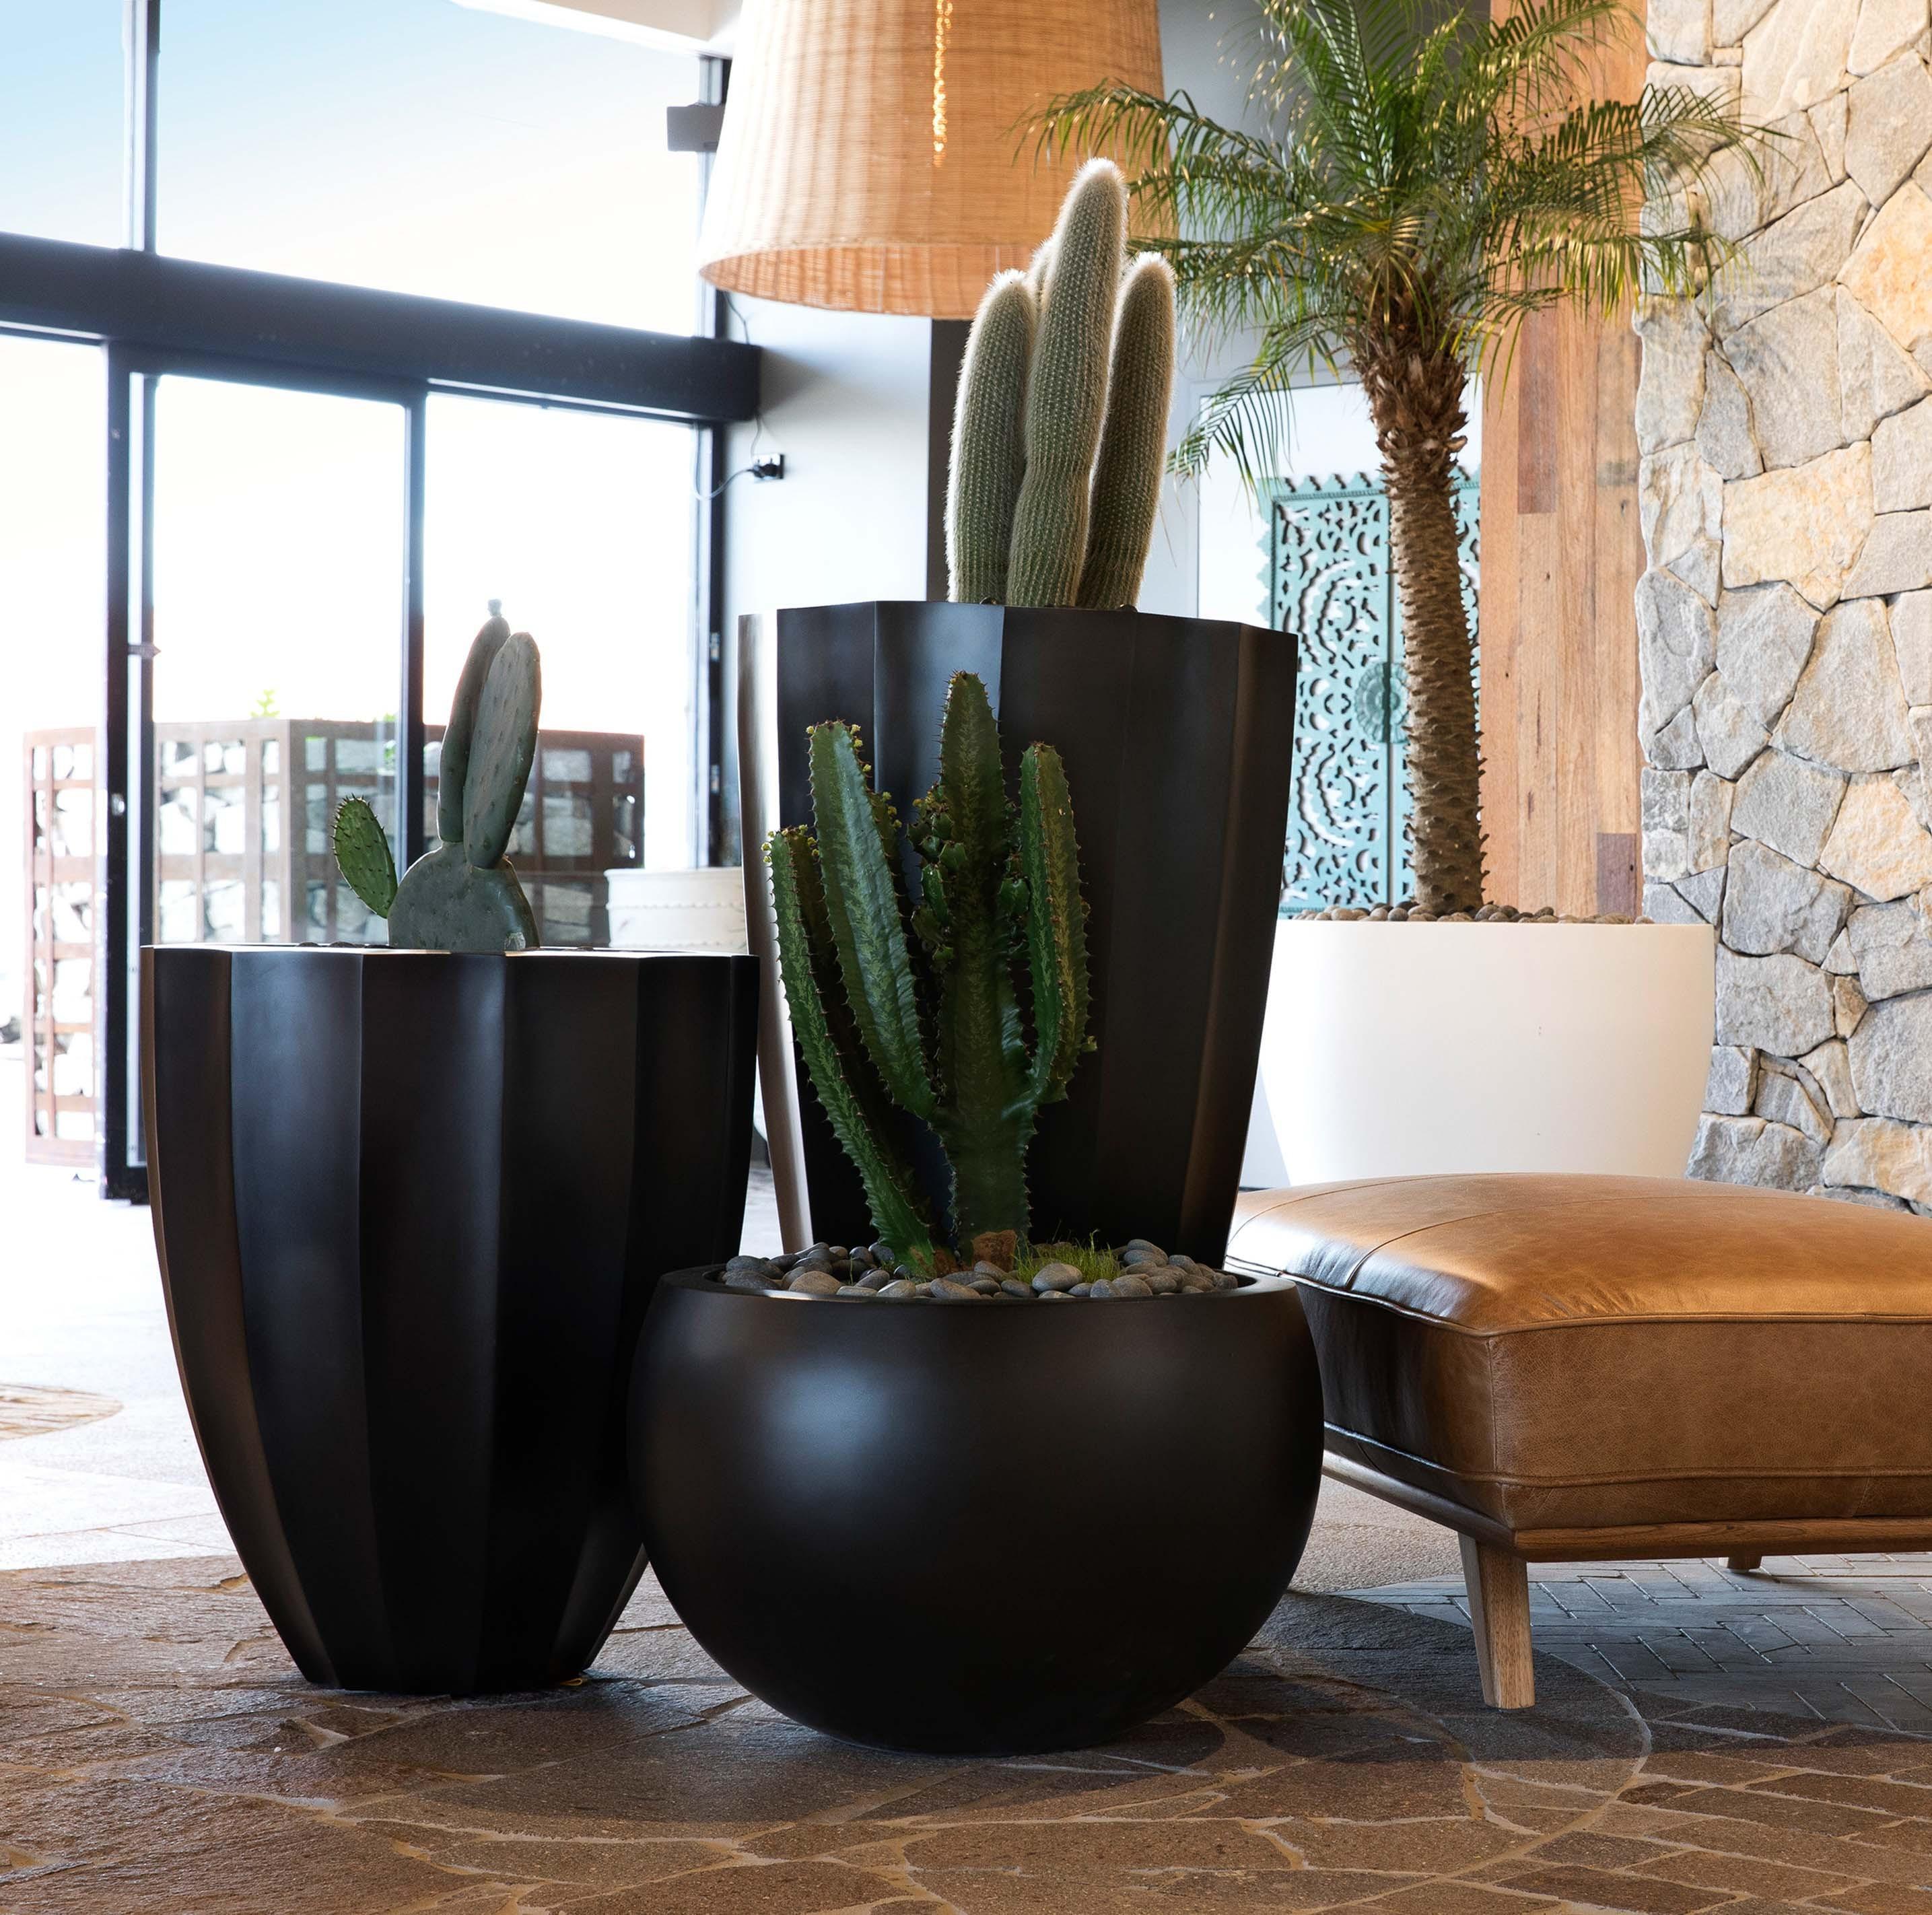 Blog hero-article-images top-5-benefits-fibreglass-pots-and-planters